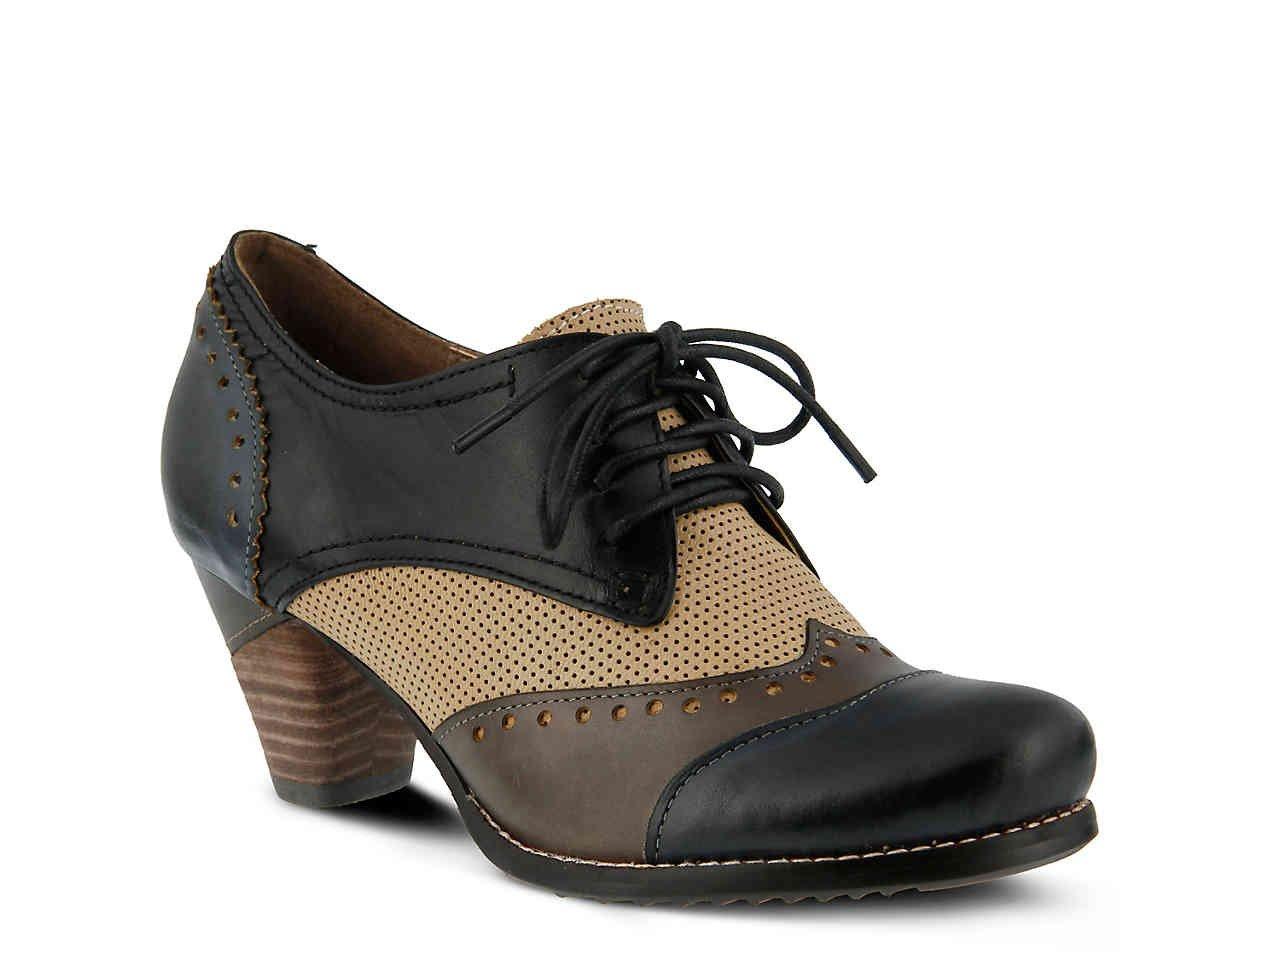 L'Artiste by Spring Step Bardot Pump Women's Shoes | DSW